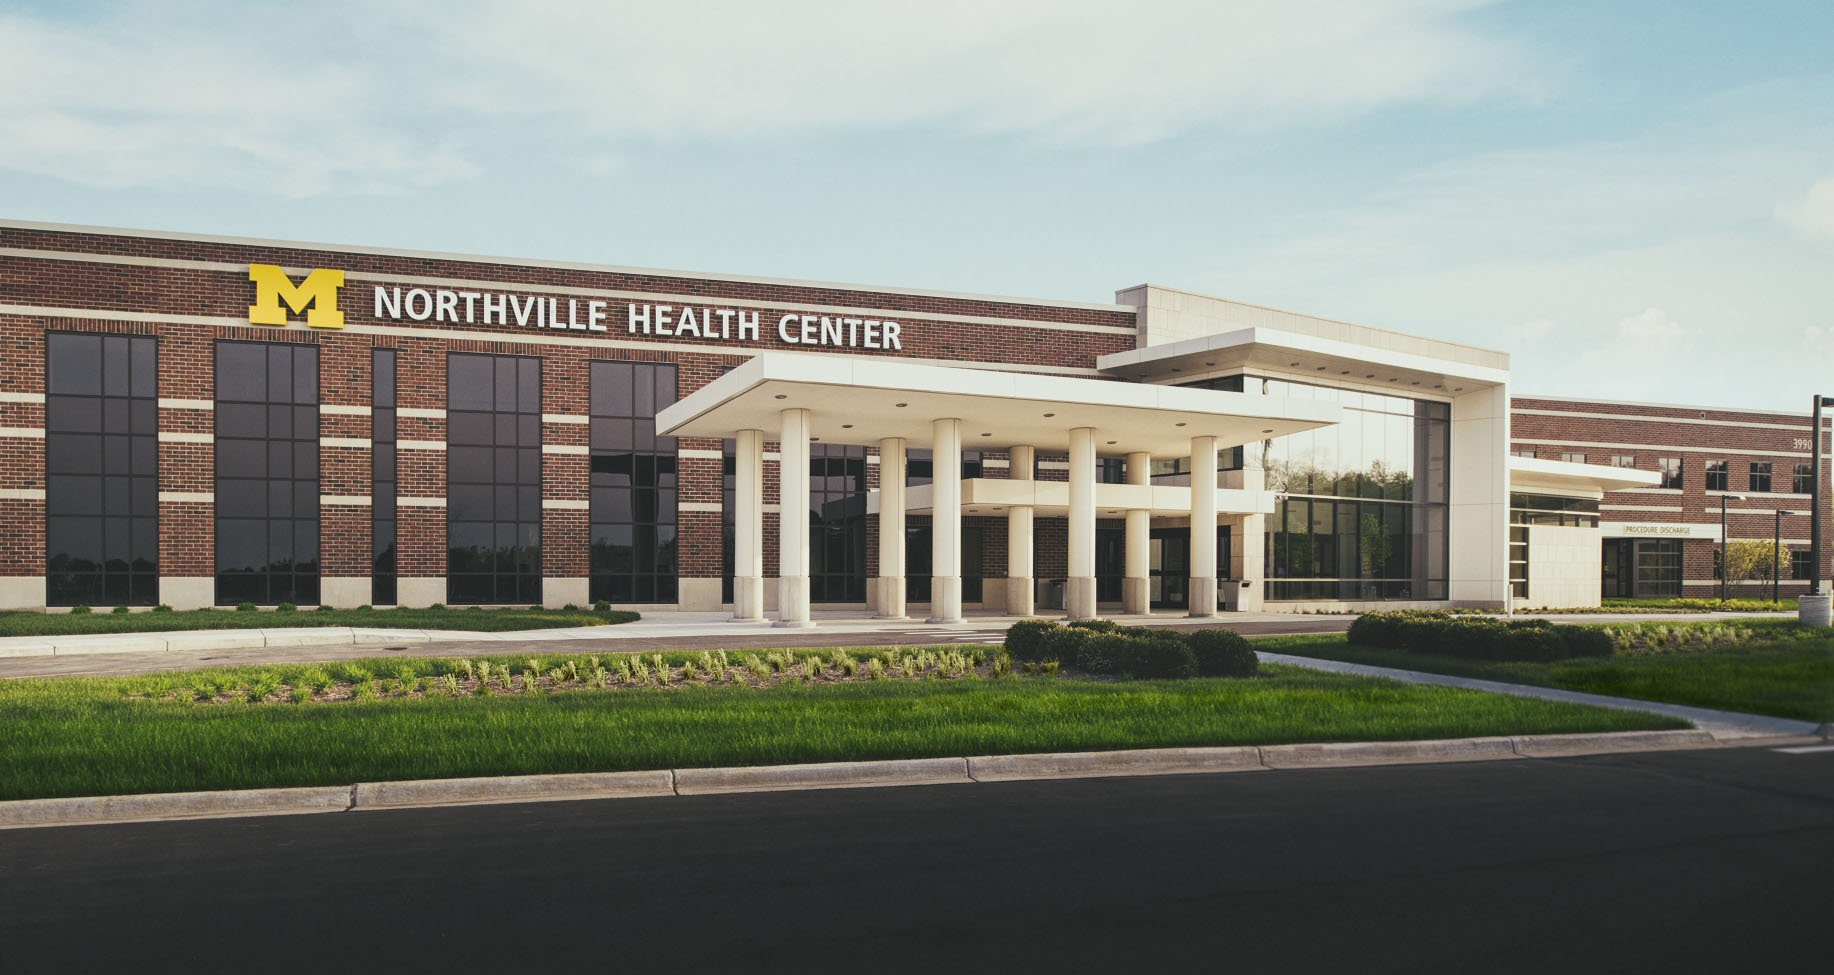 Northville Health Center